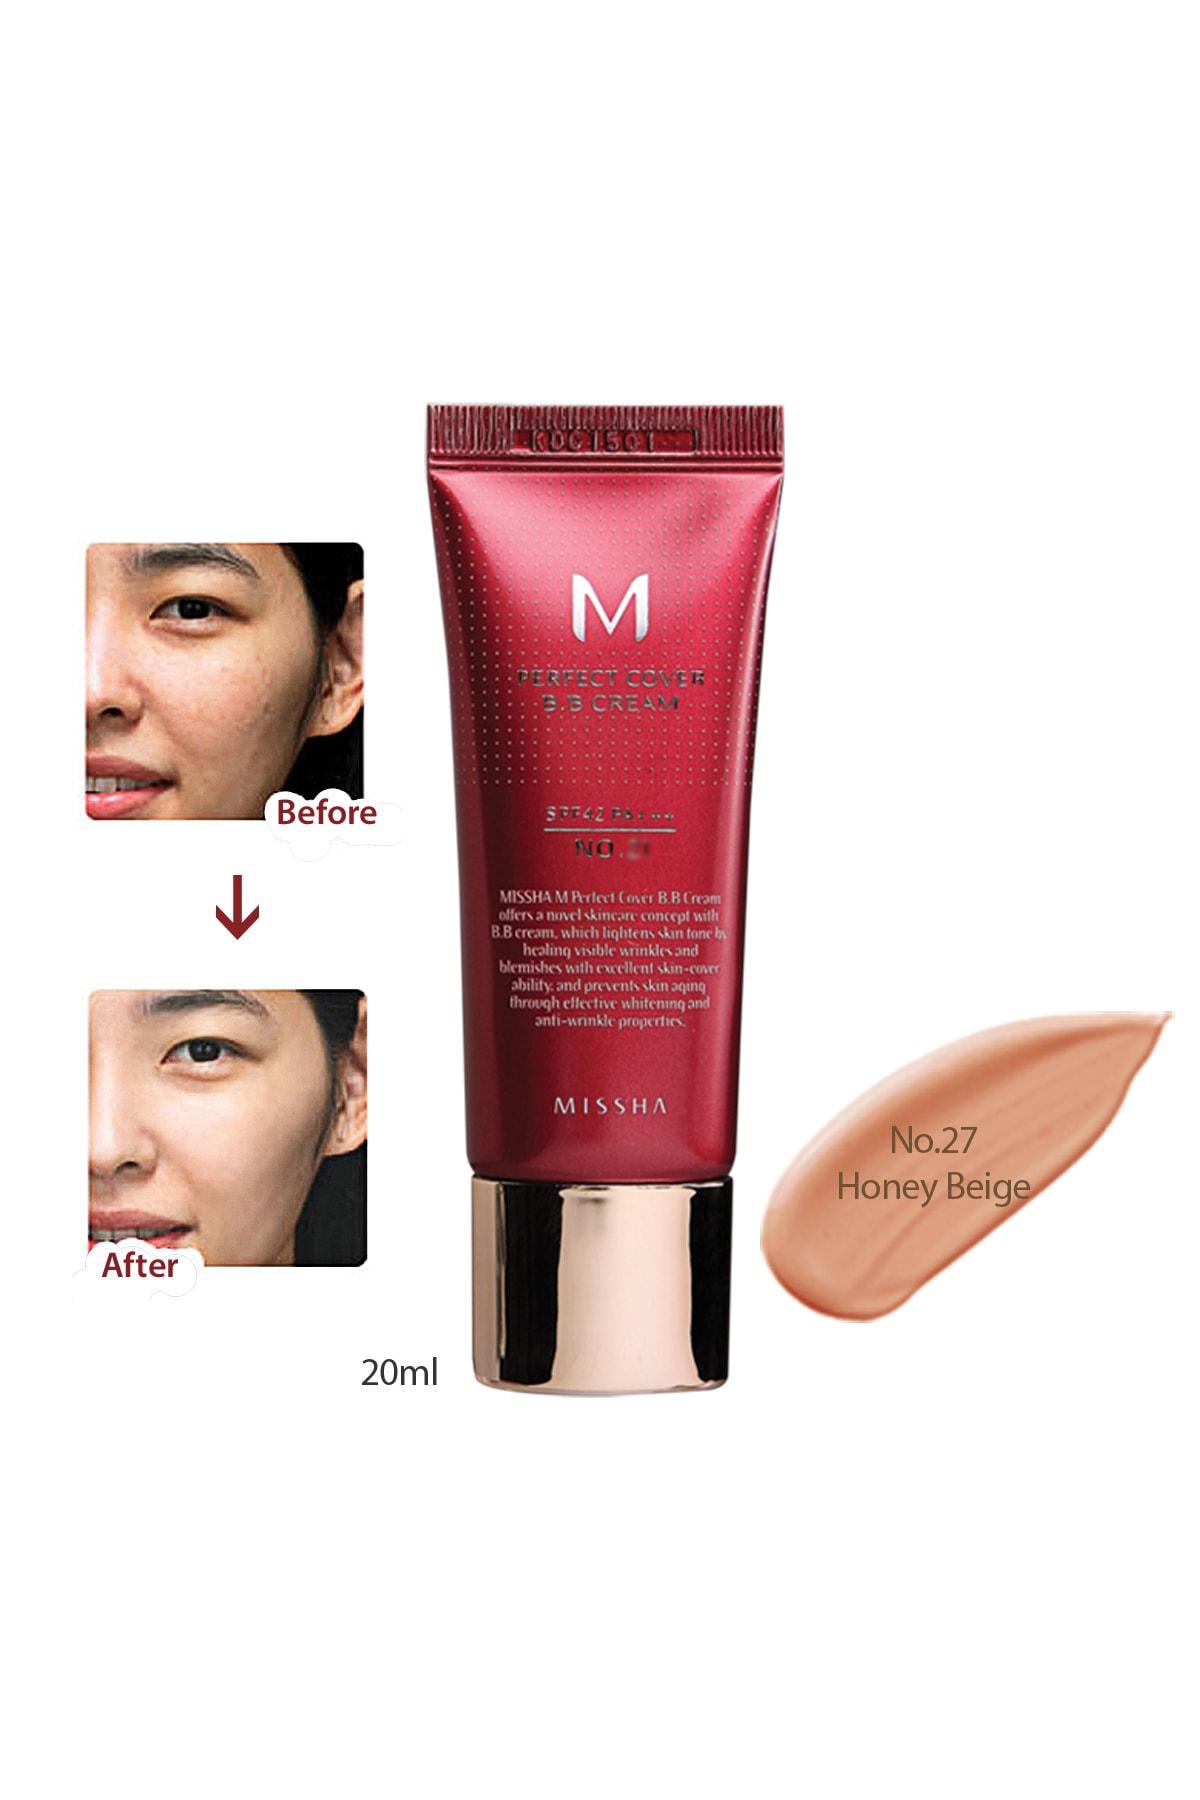 Missha Yoğun Kapatıcılık Sunan BB Krem M Perfect Cover BB Cream SPF42/PA+++ No: 27 ( 20 ML ) 0